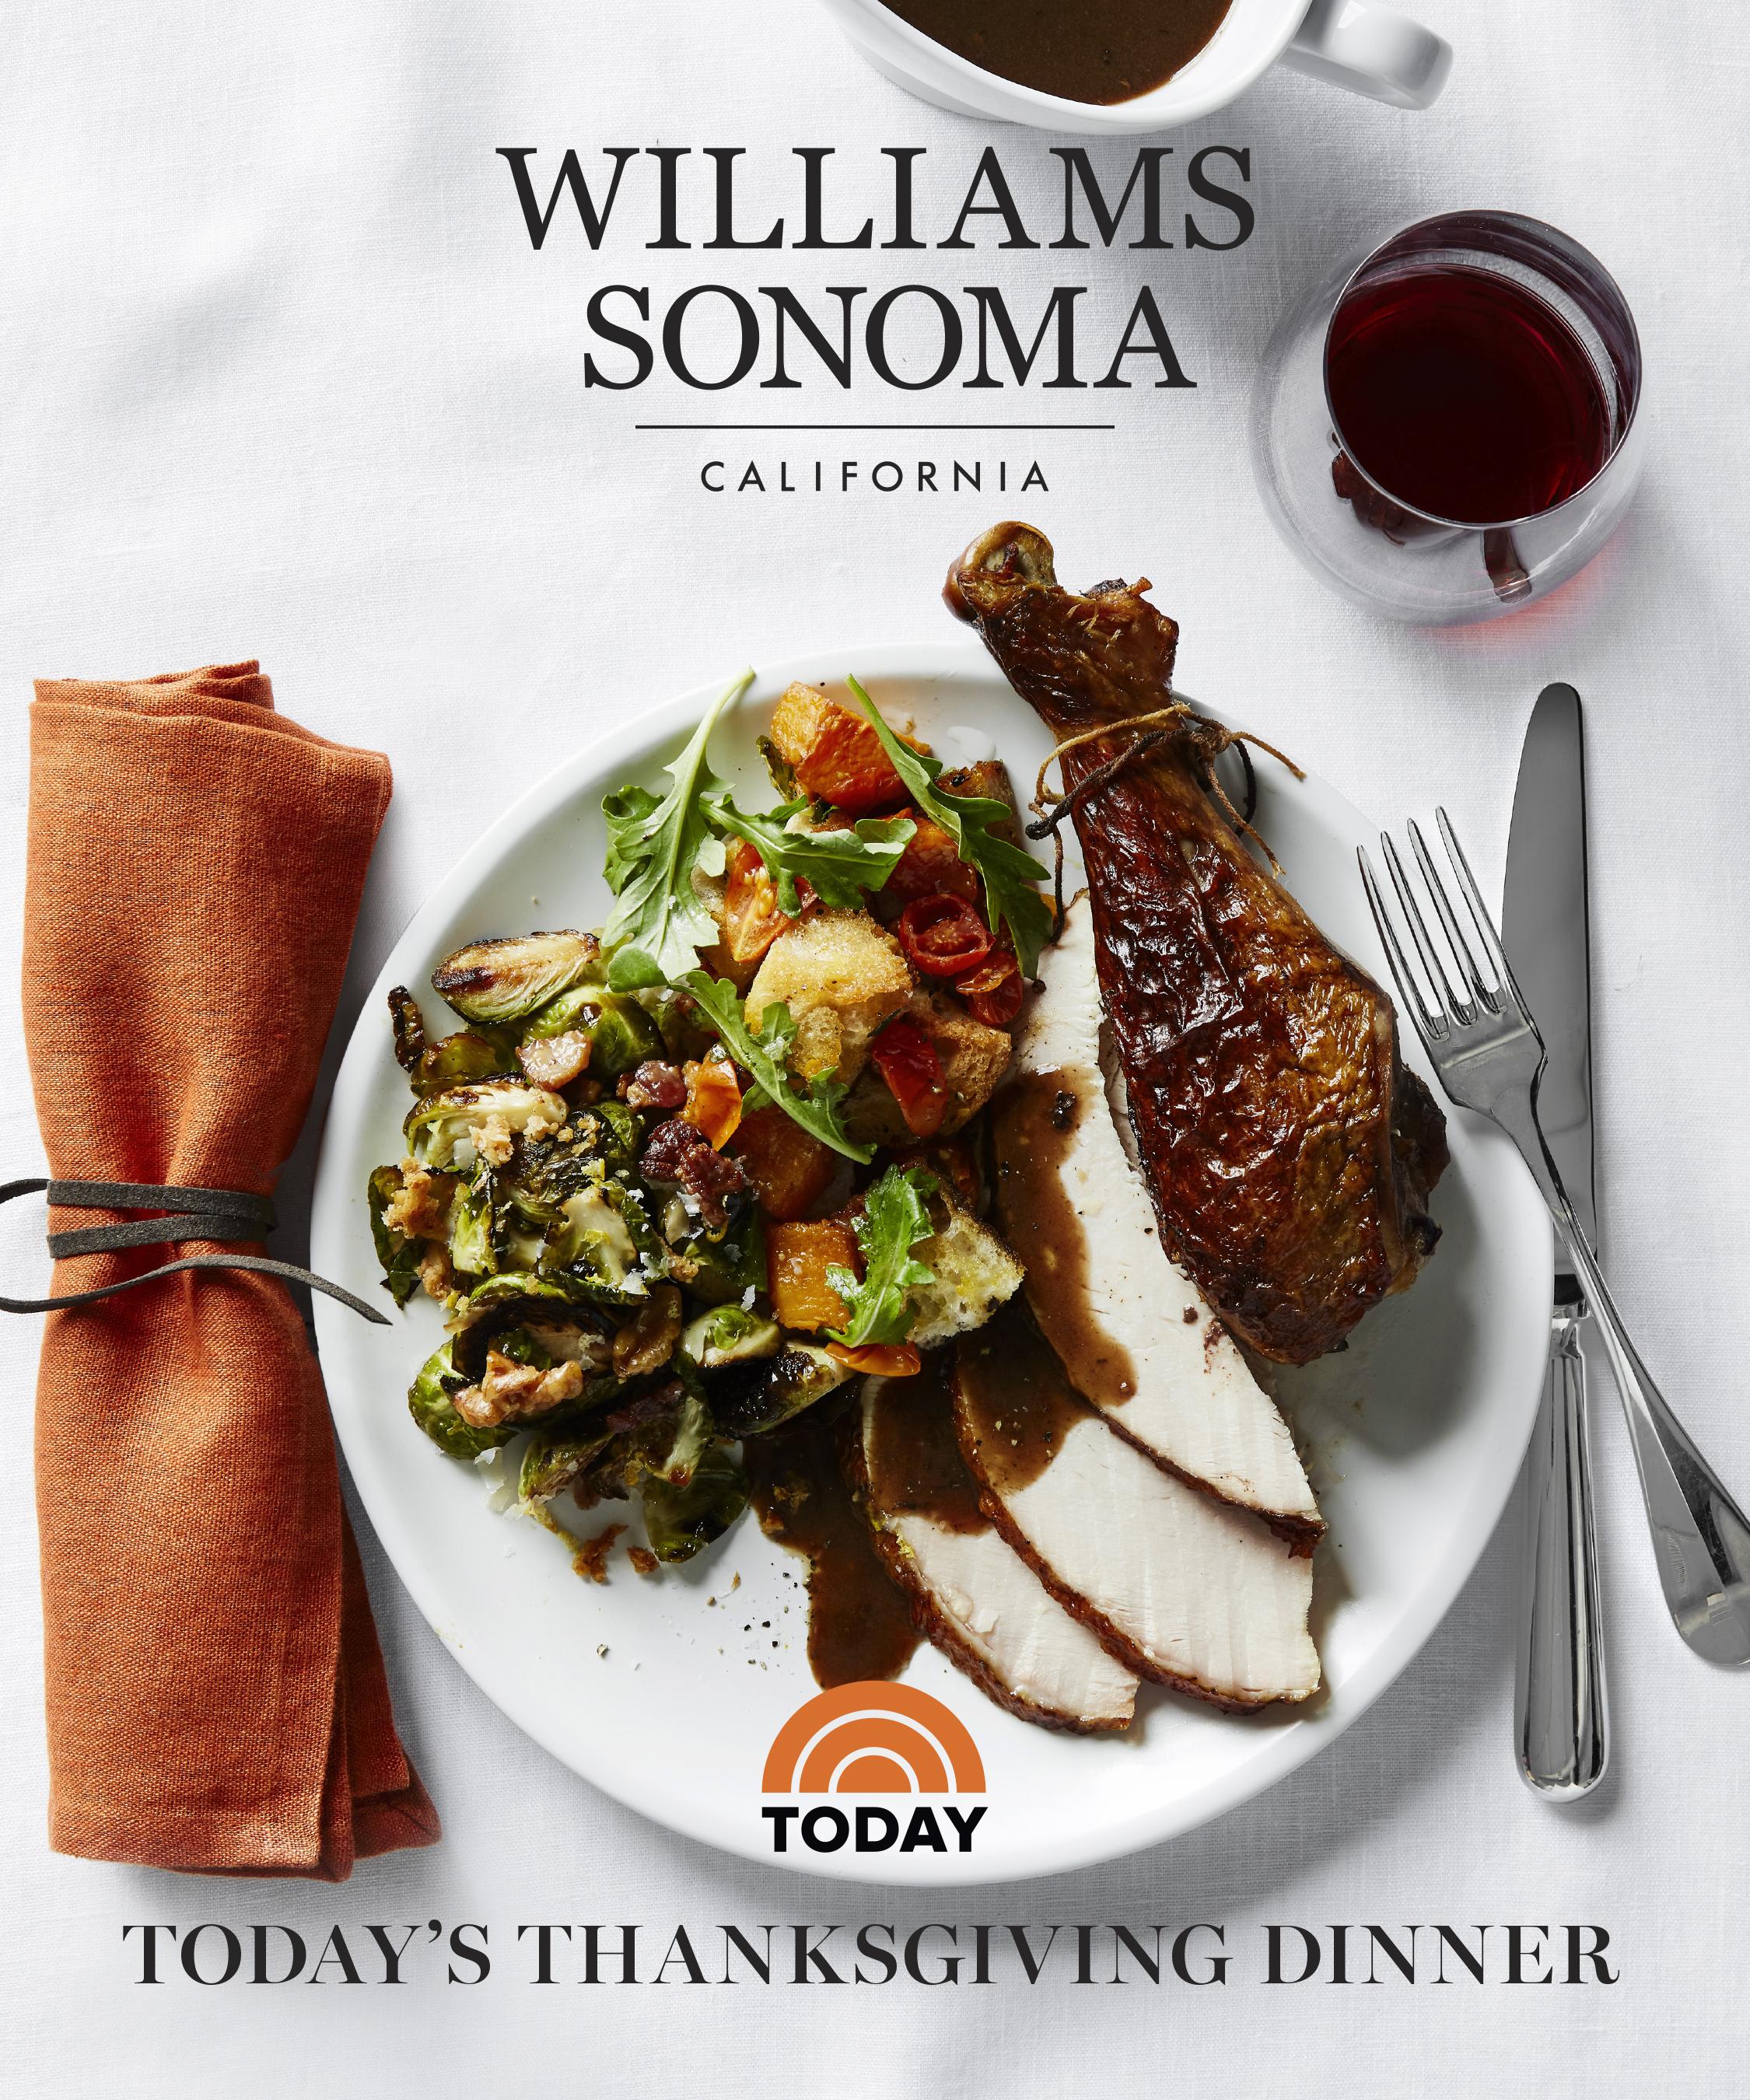 Williams Sonoma Launches Partnership